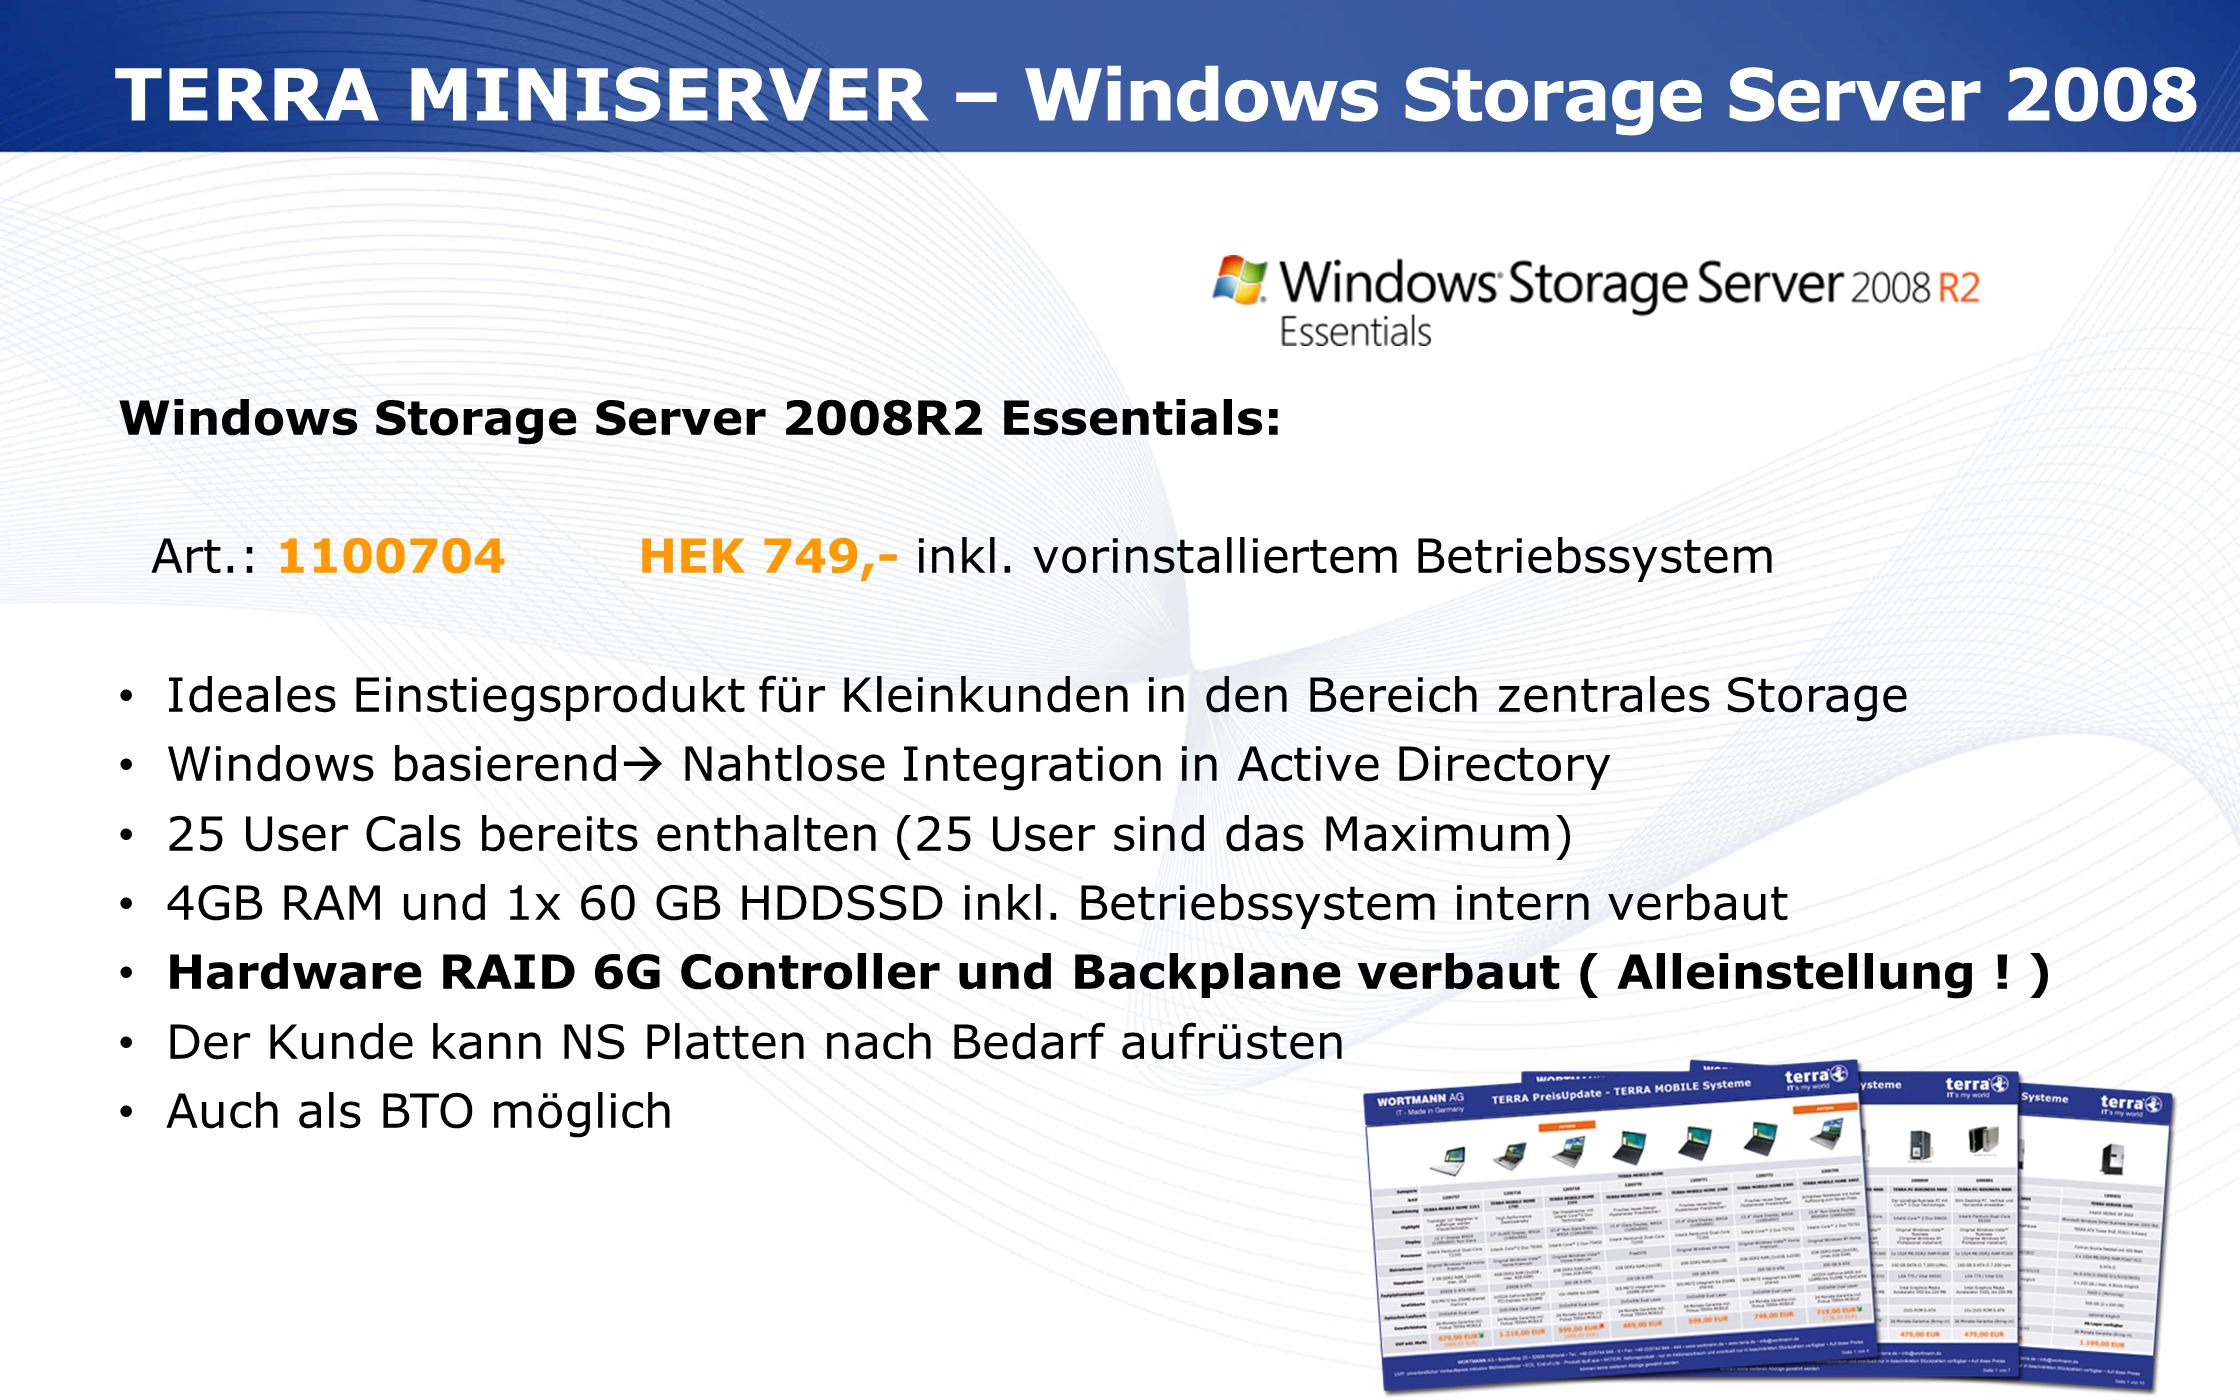 TERRA MINISERVER – Windows Storage Server 2008